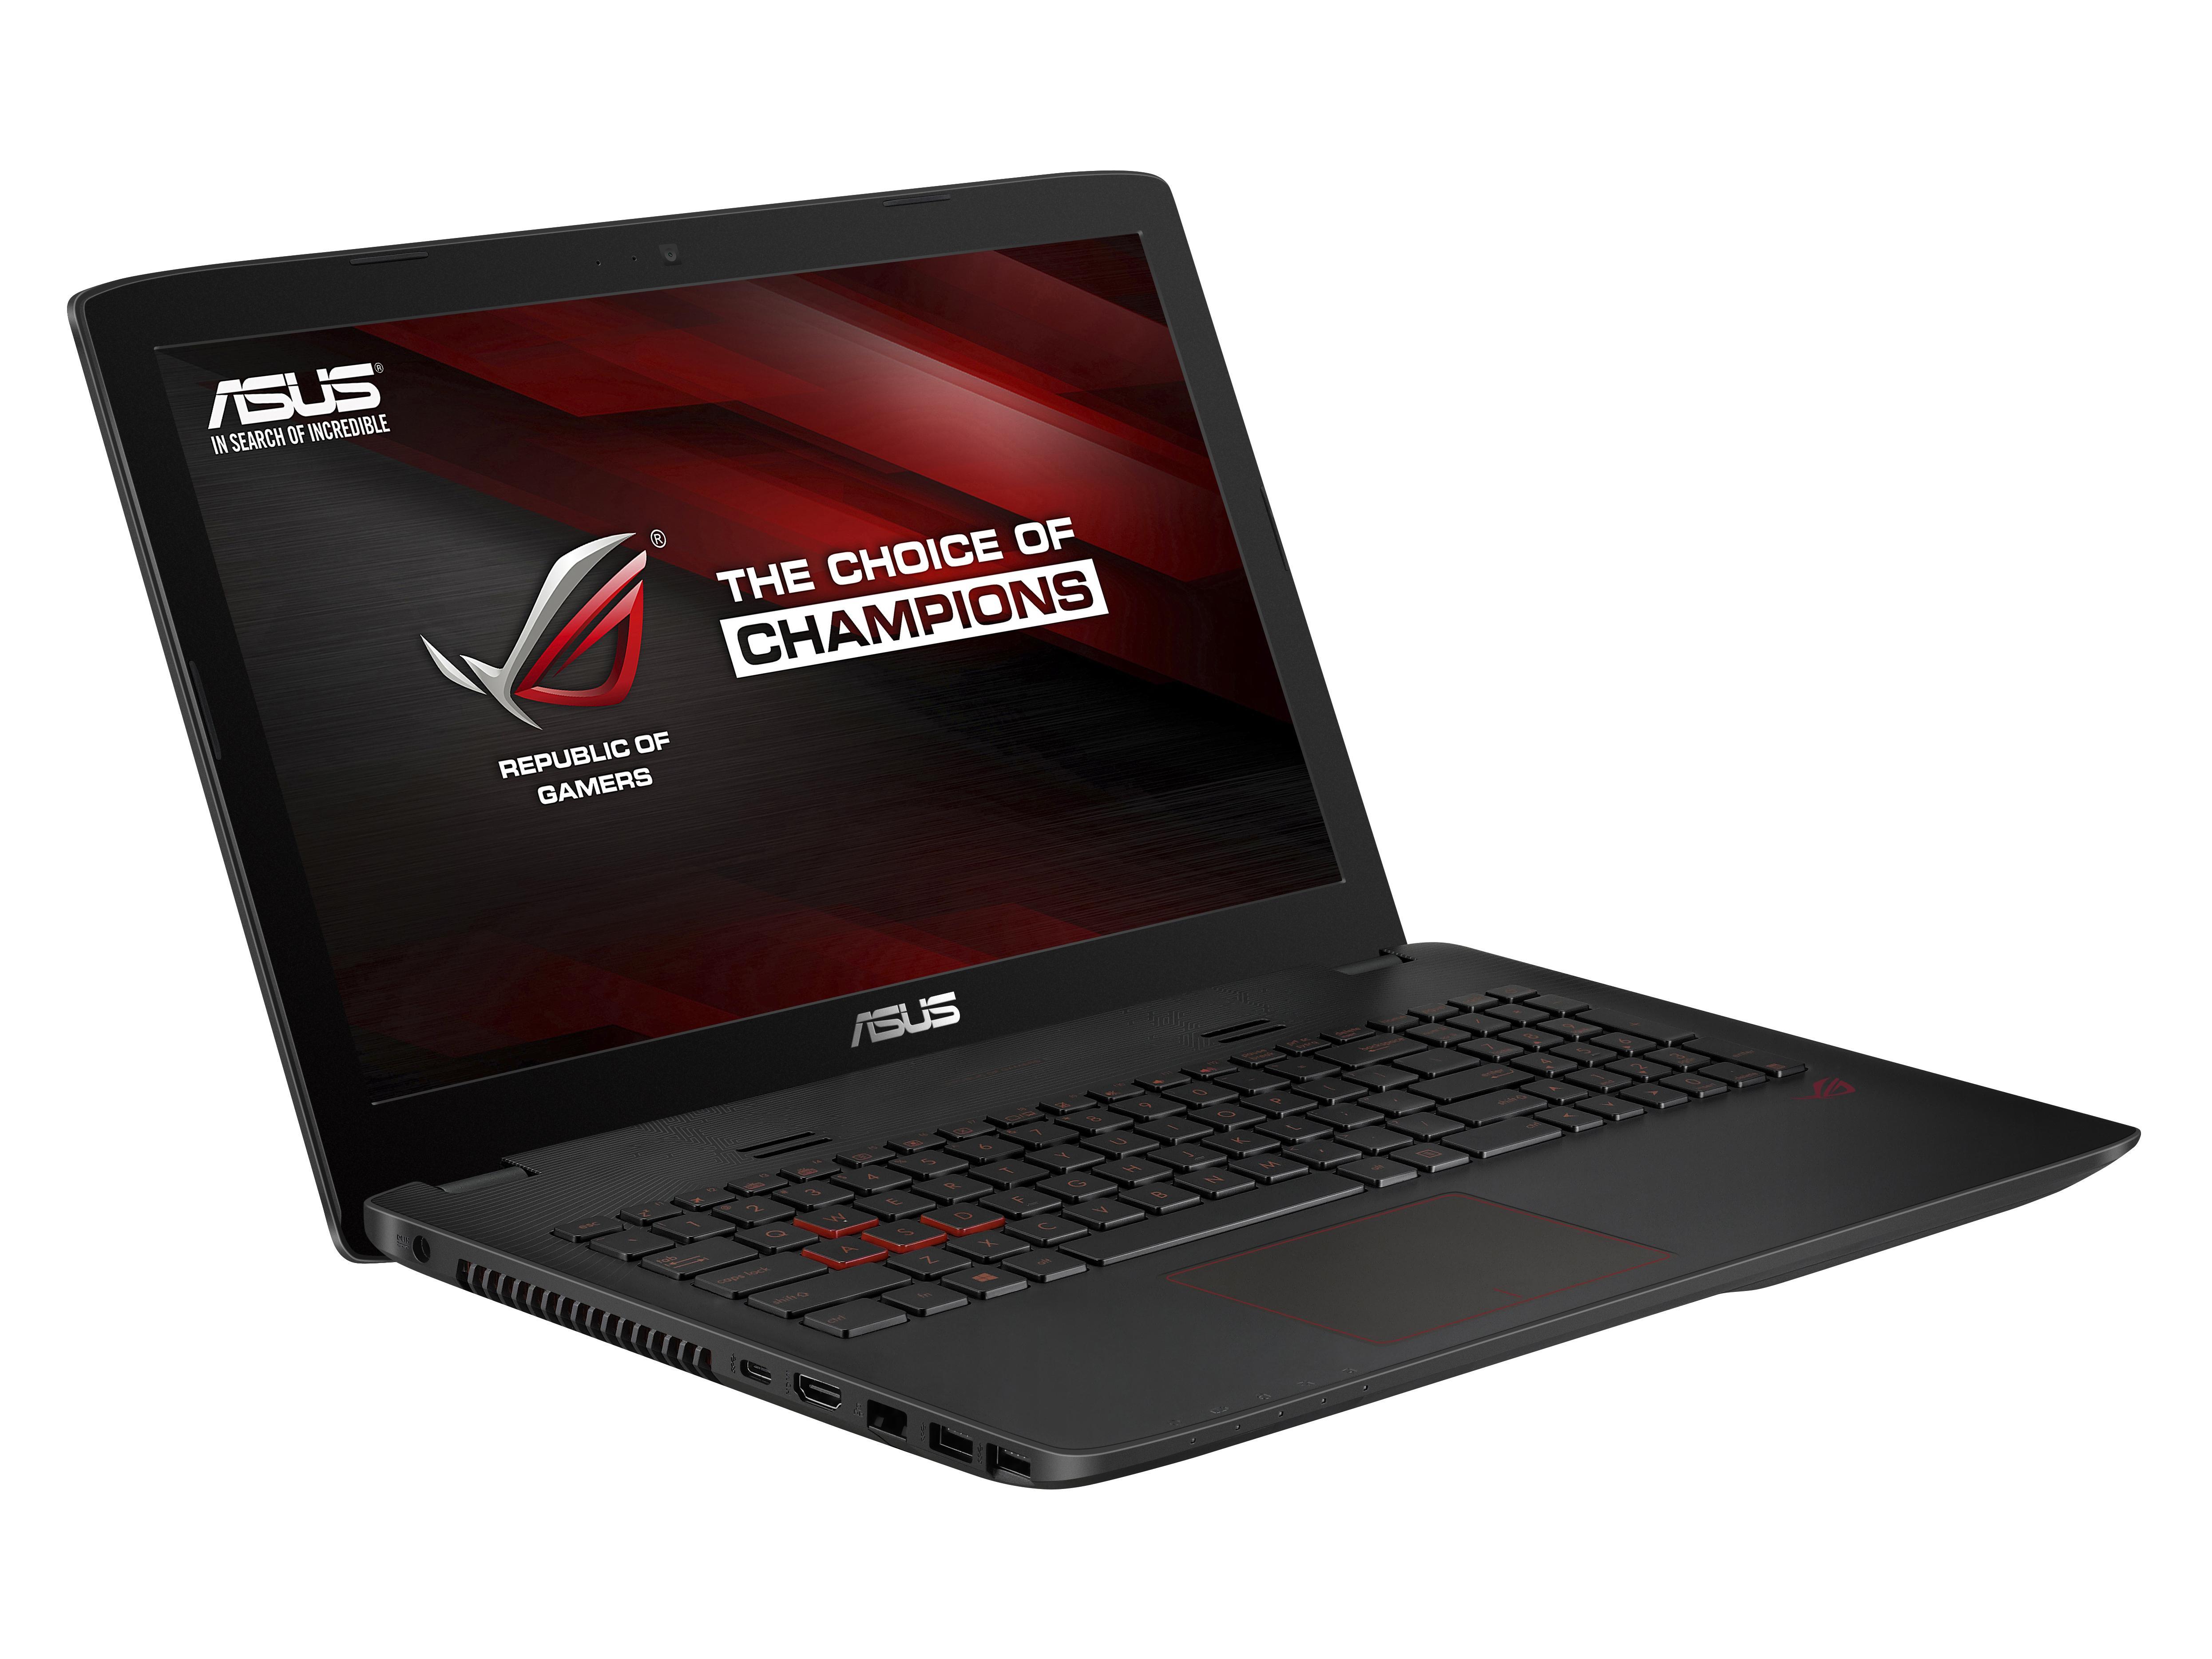 "ASUS GL552VX-CN146T i5-6300H/8GB/1TB HDD/DVD-RW/15,6"" FHD/GTX950M 2GB/Win10/černý"